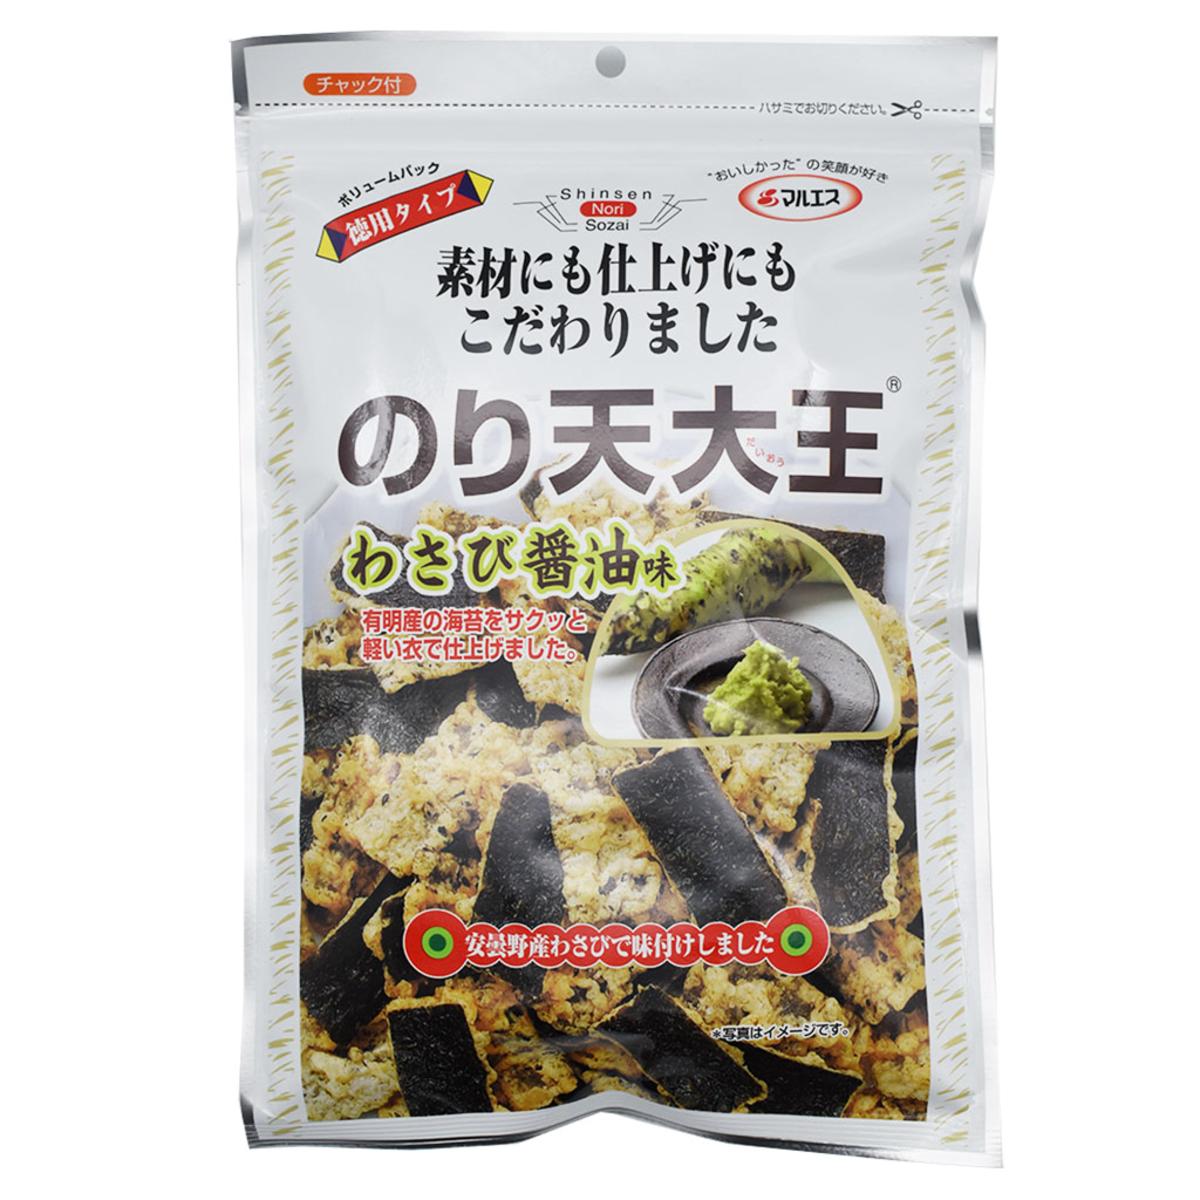 MARUESU 紫菜天婦羅大王 91g